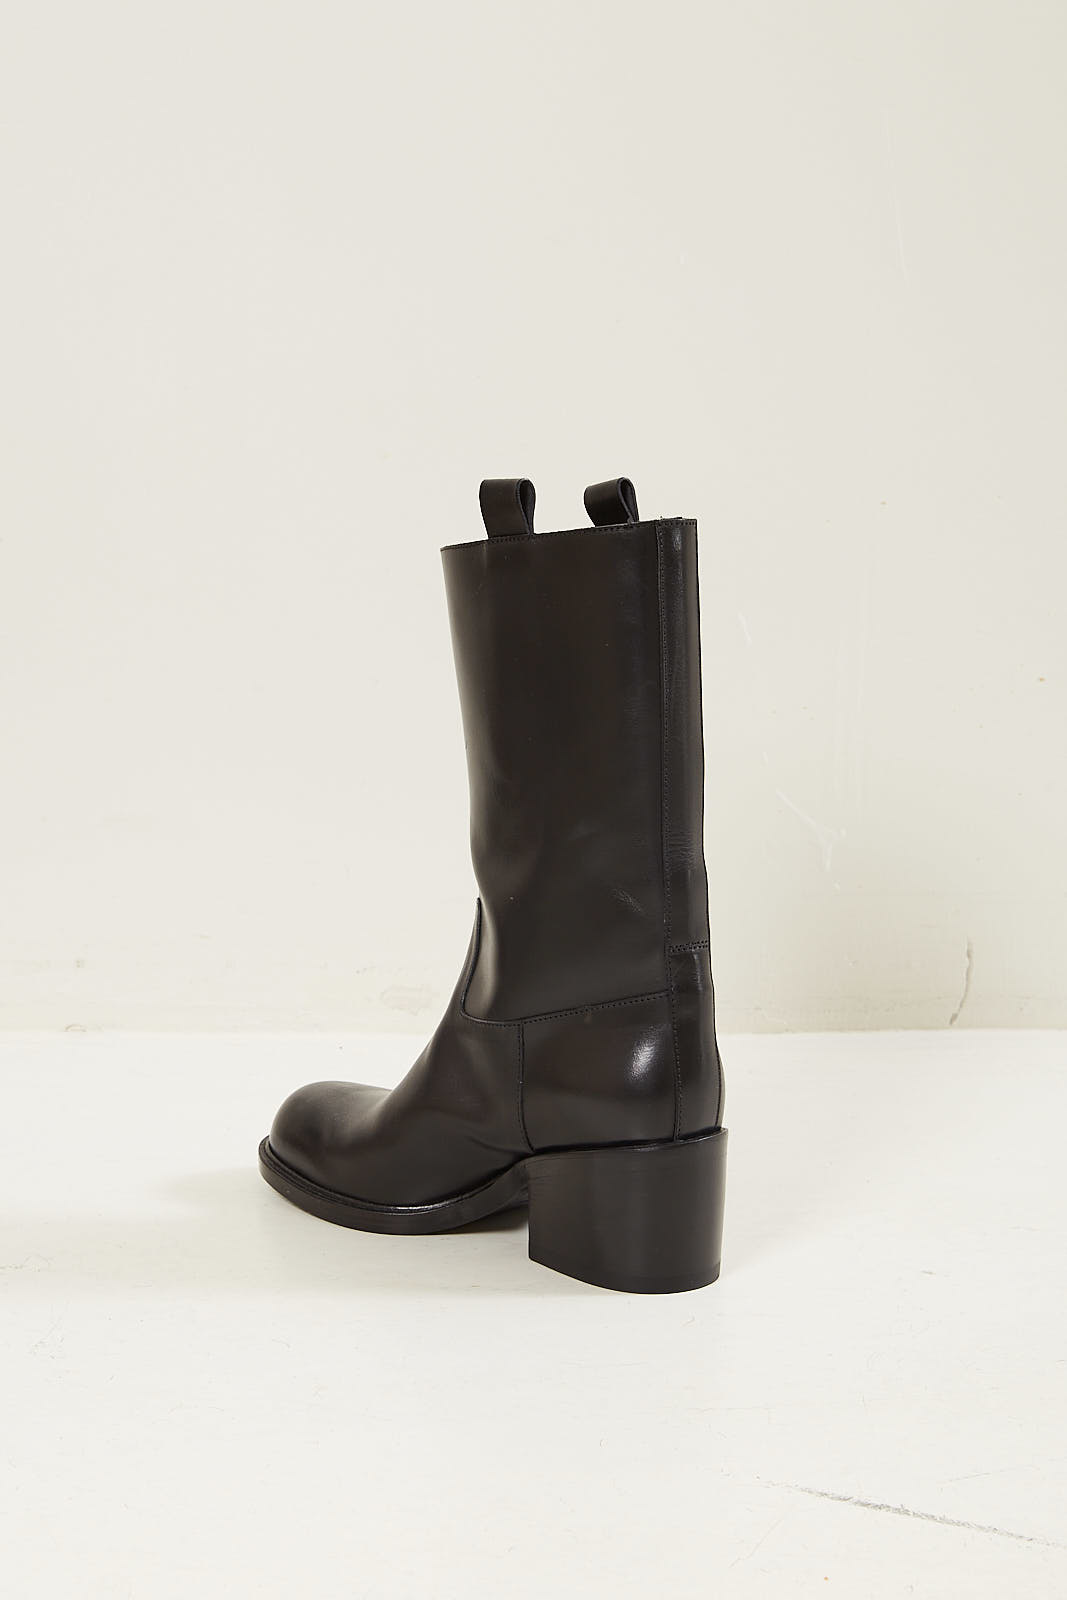 A.F. Vandevorst - Low boots